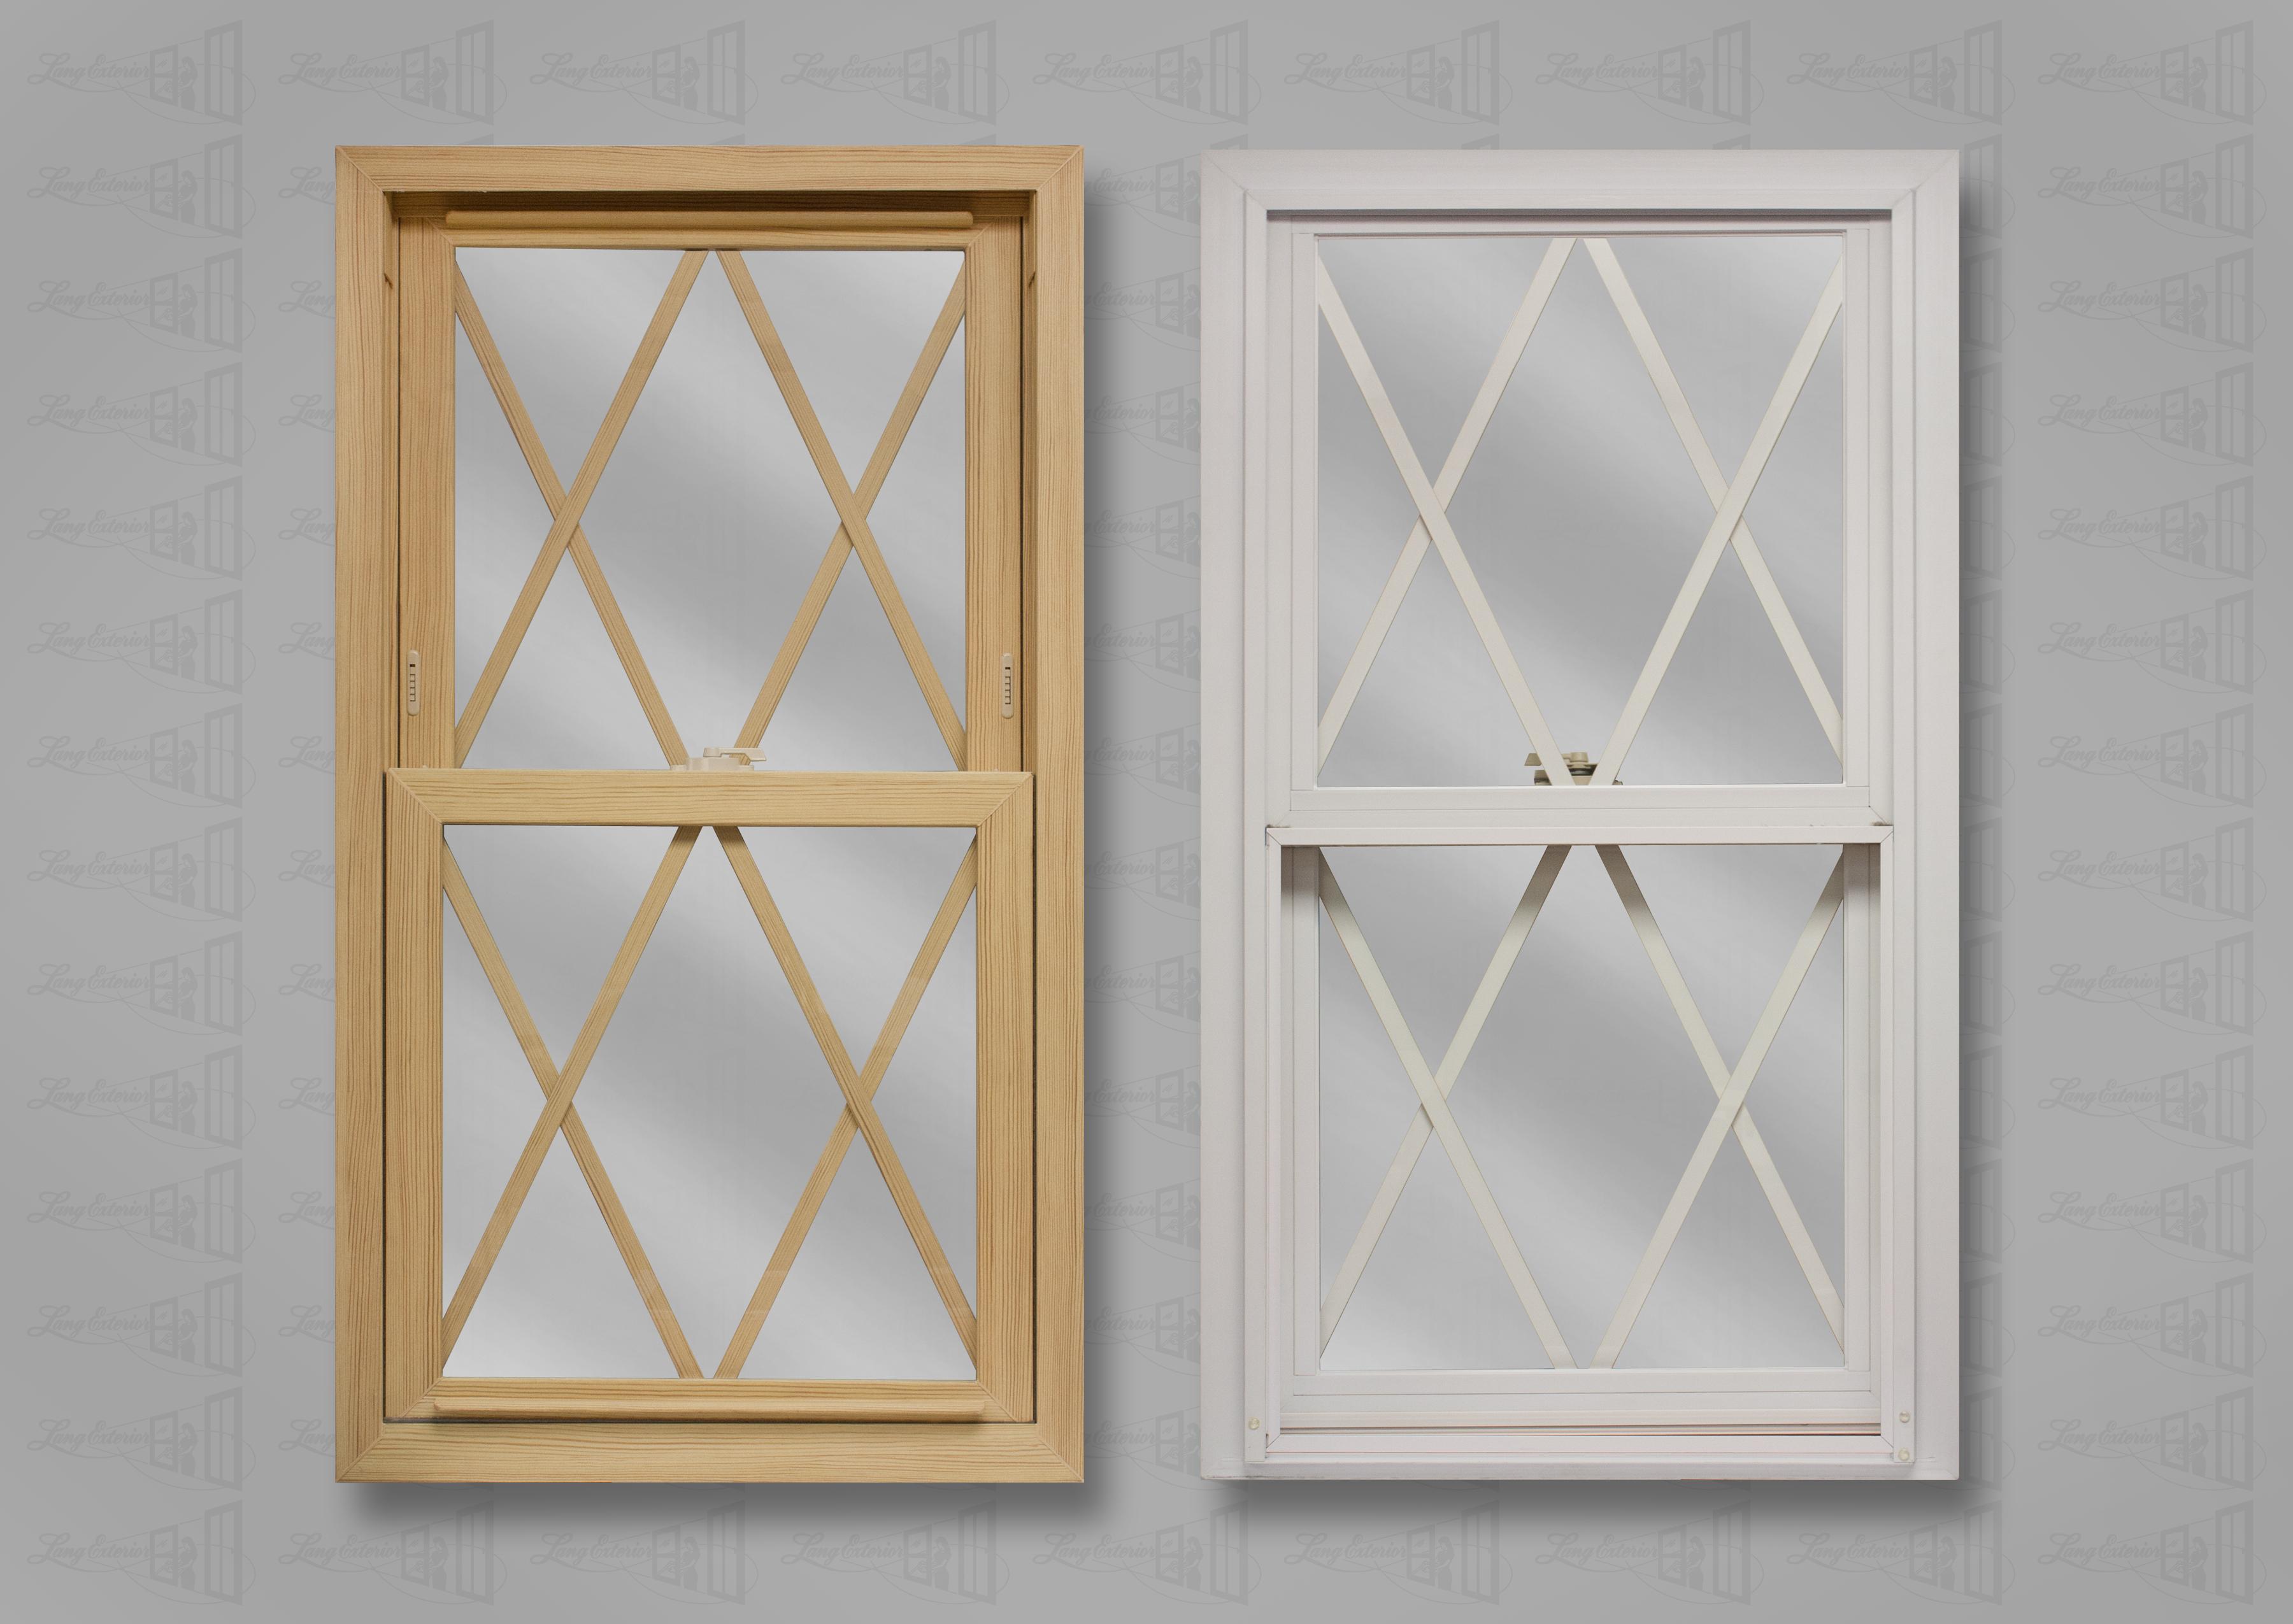 powerweld 1600 series double hung window